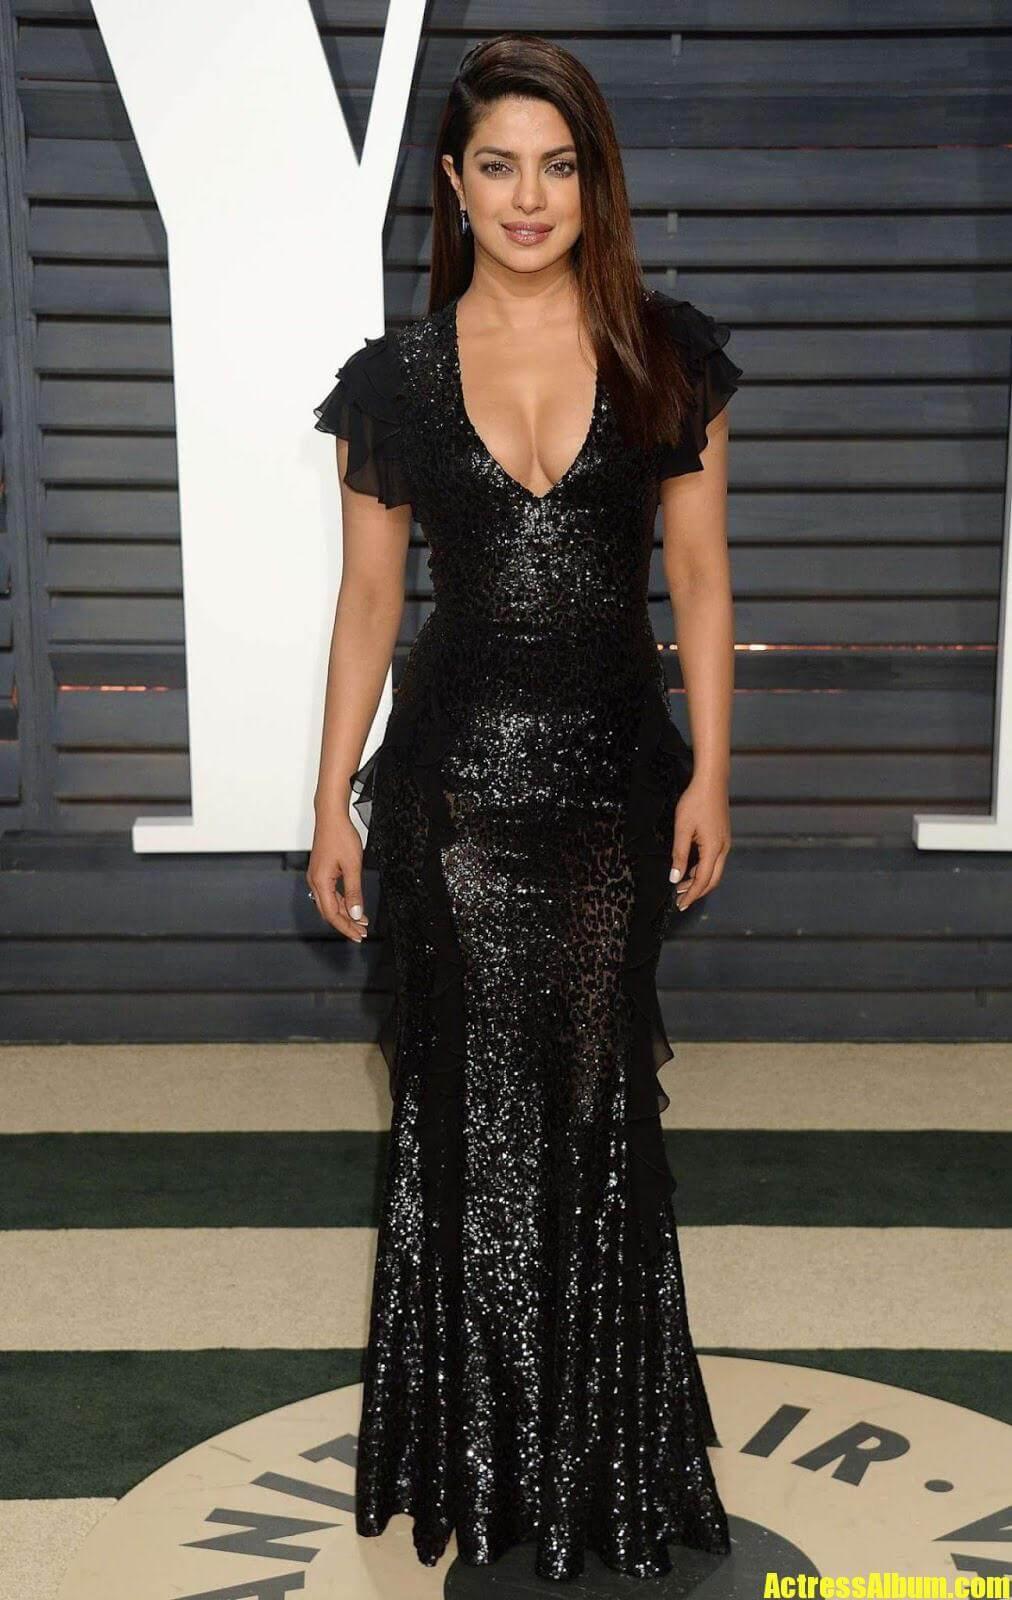 Priyanka Chopra In Black Gown at Oscars Awards